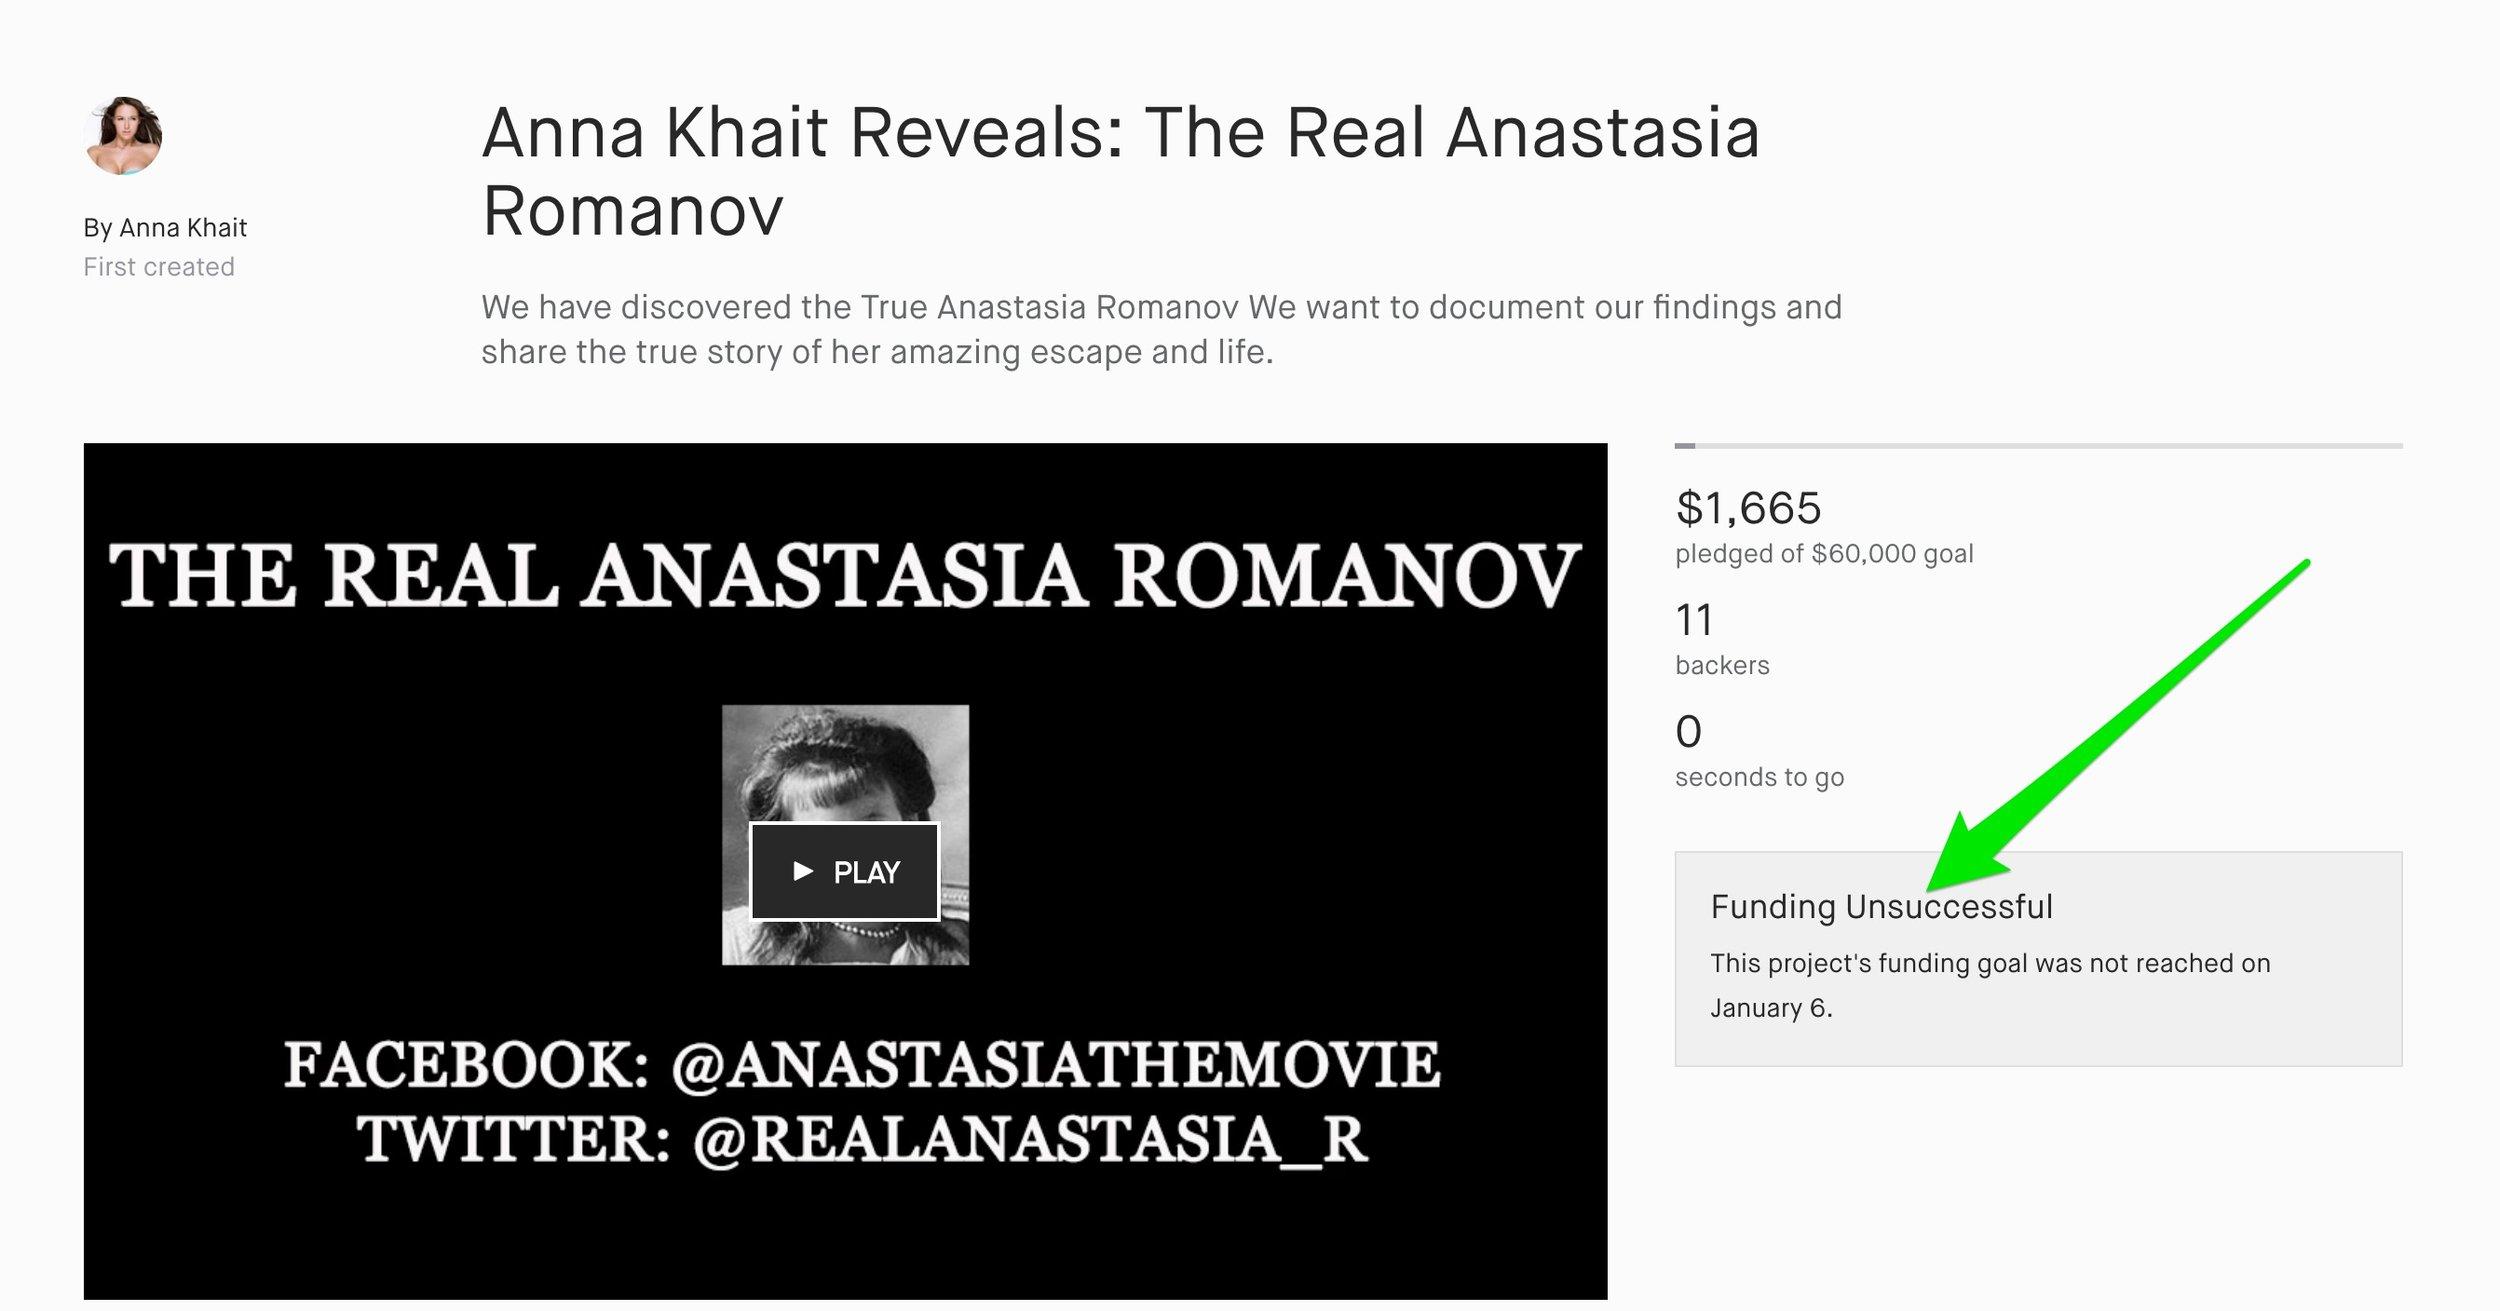 Anna_Khait_Reveals__The_Real_Anastasia_Romanov_by_Anna_Khait_—_Kickstarter.jpg